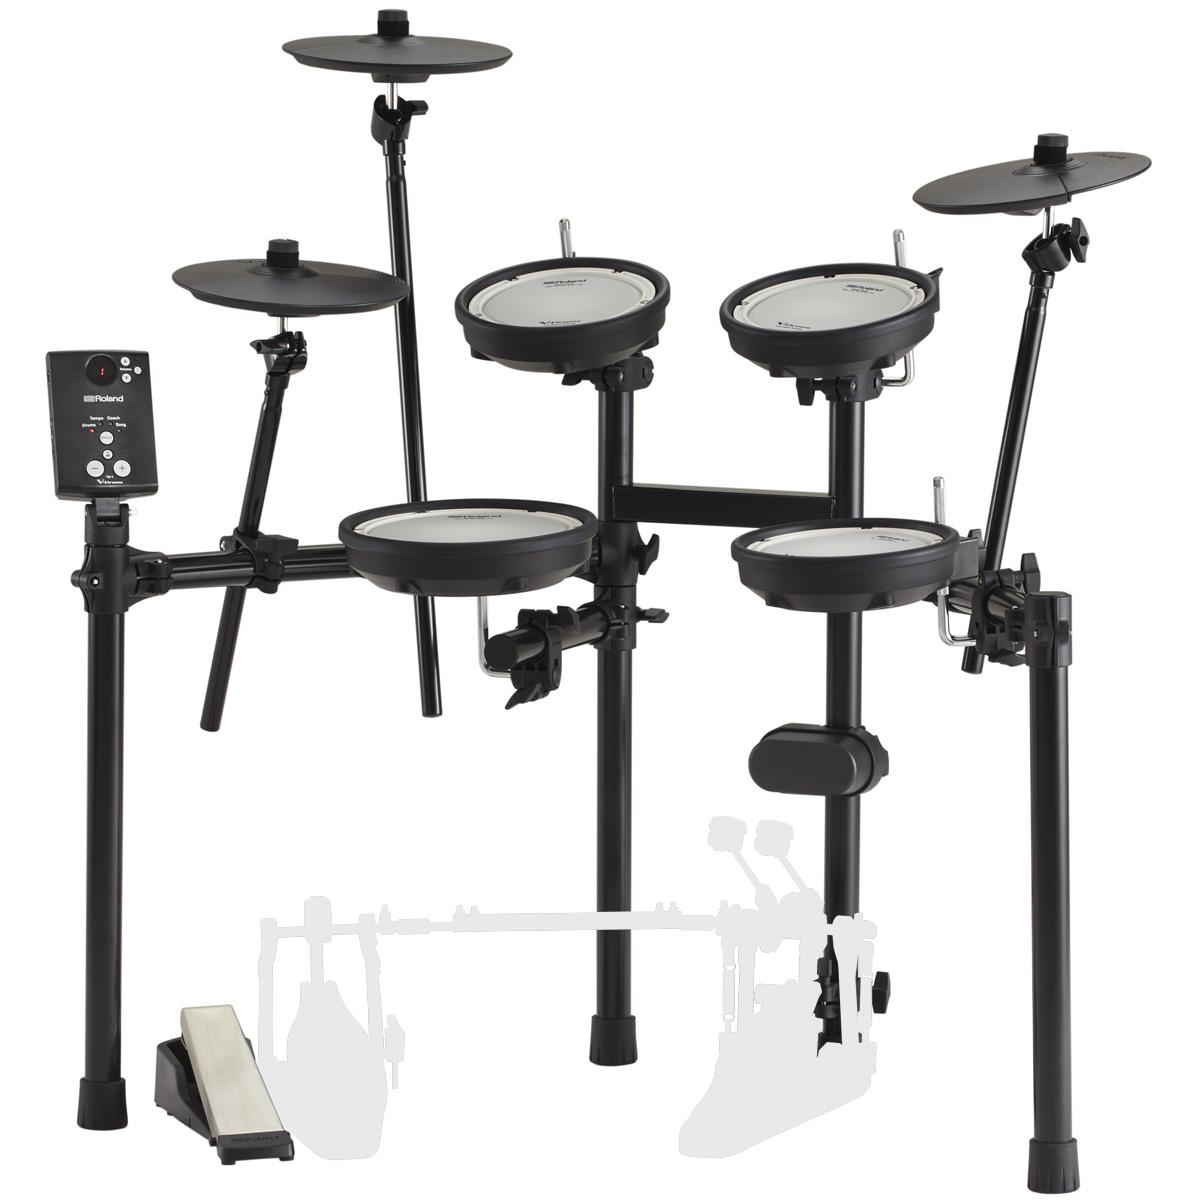 Roland / TD-1DMK ローランド 電子ドラム TD-1 Double Mesh Kit (キックペダル別売)【PNG】